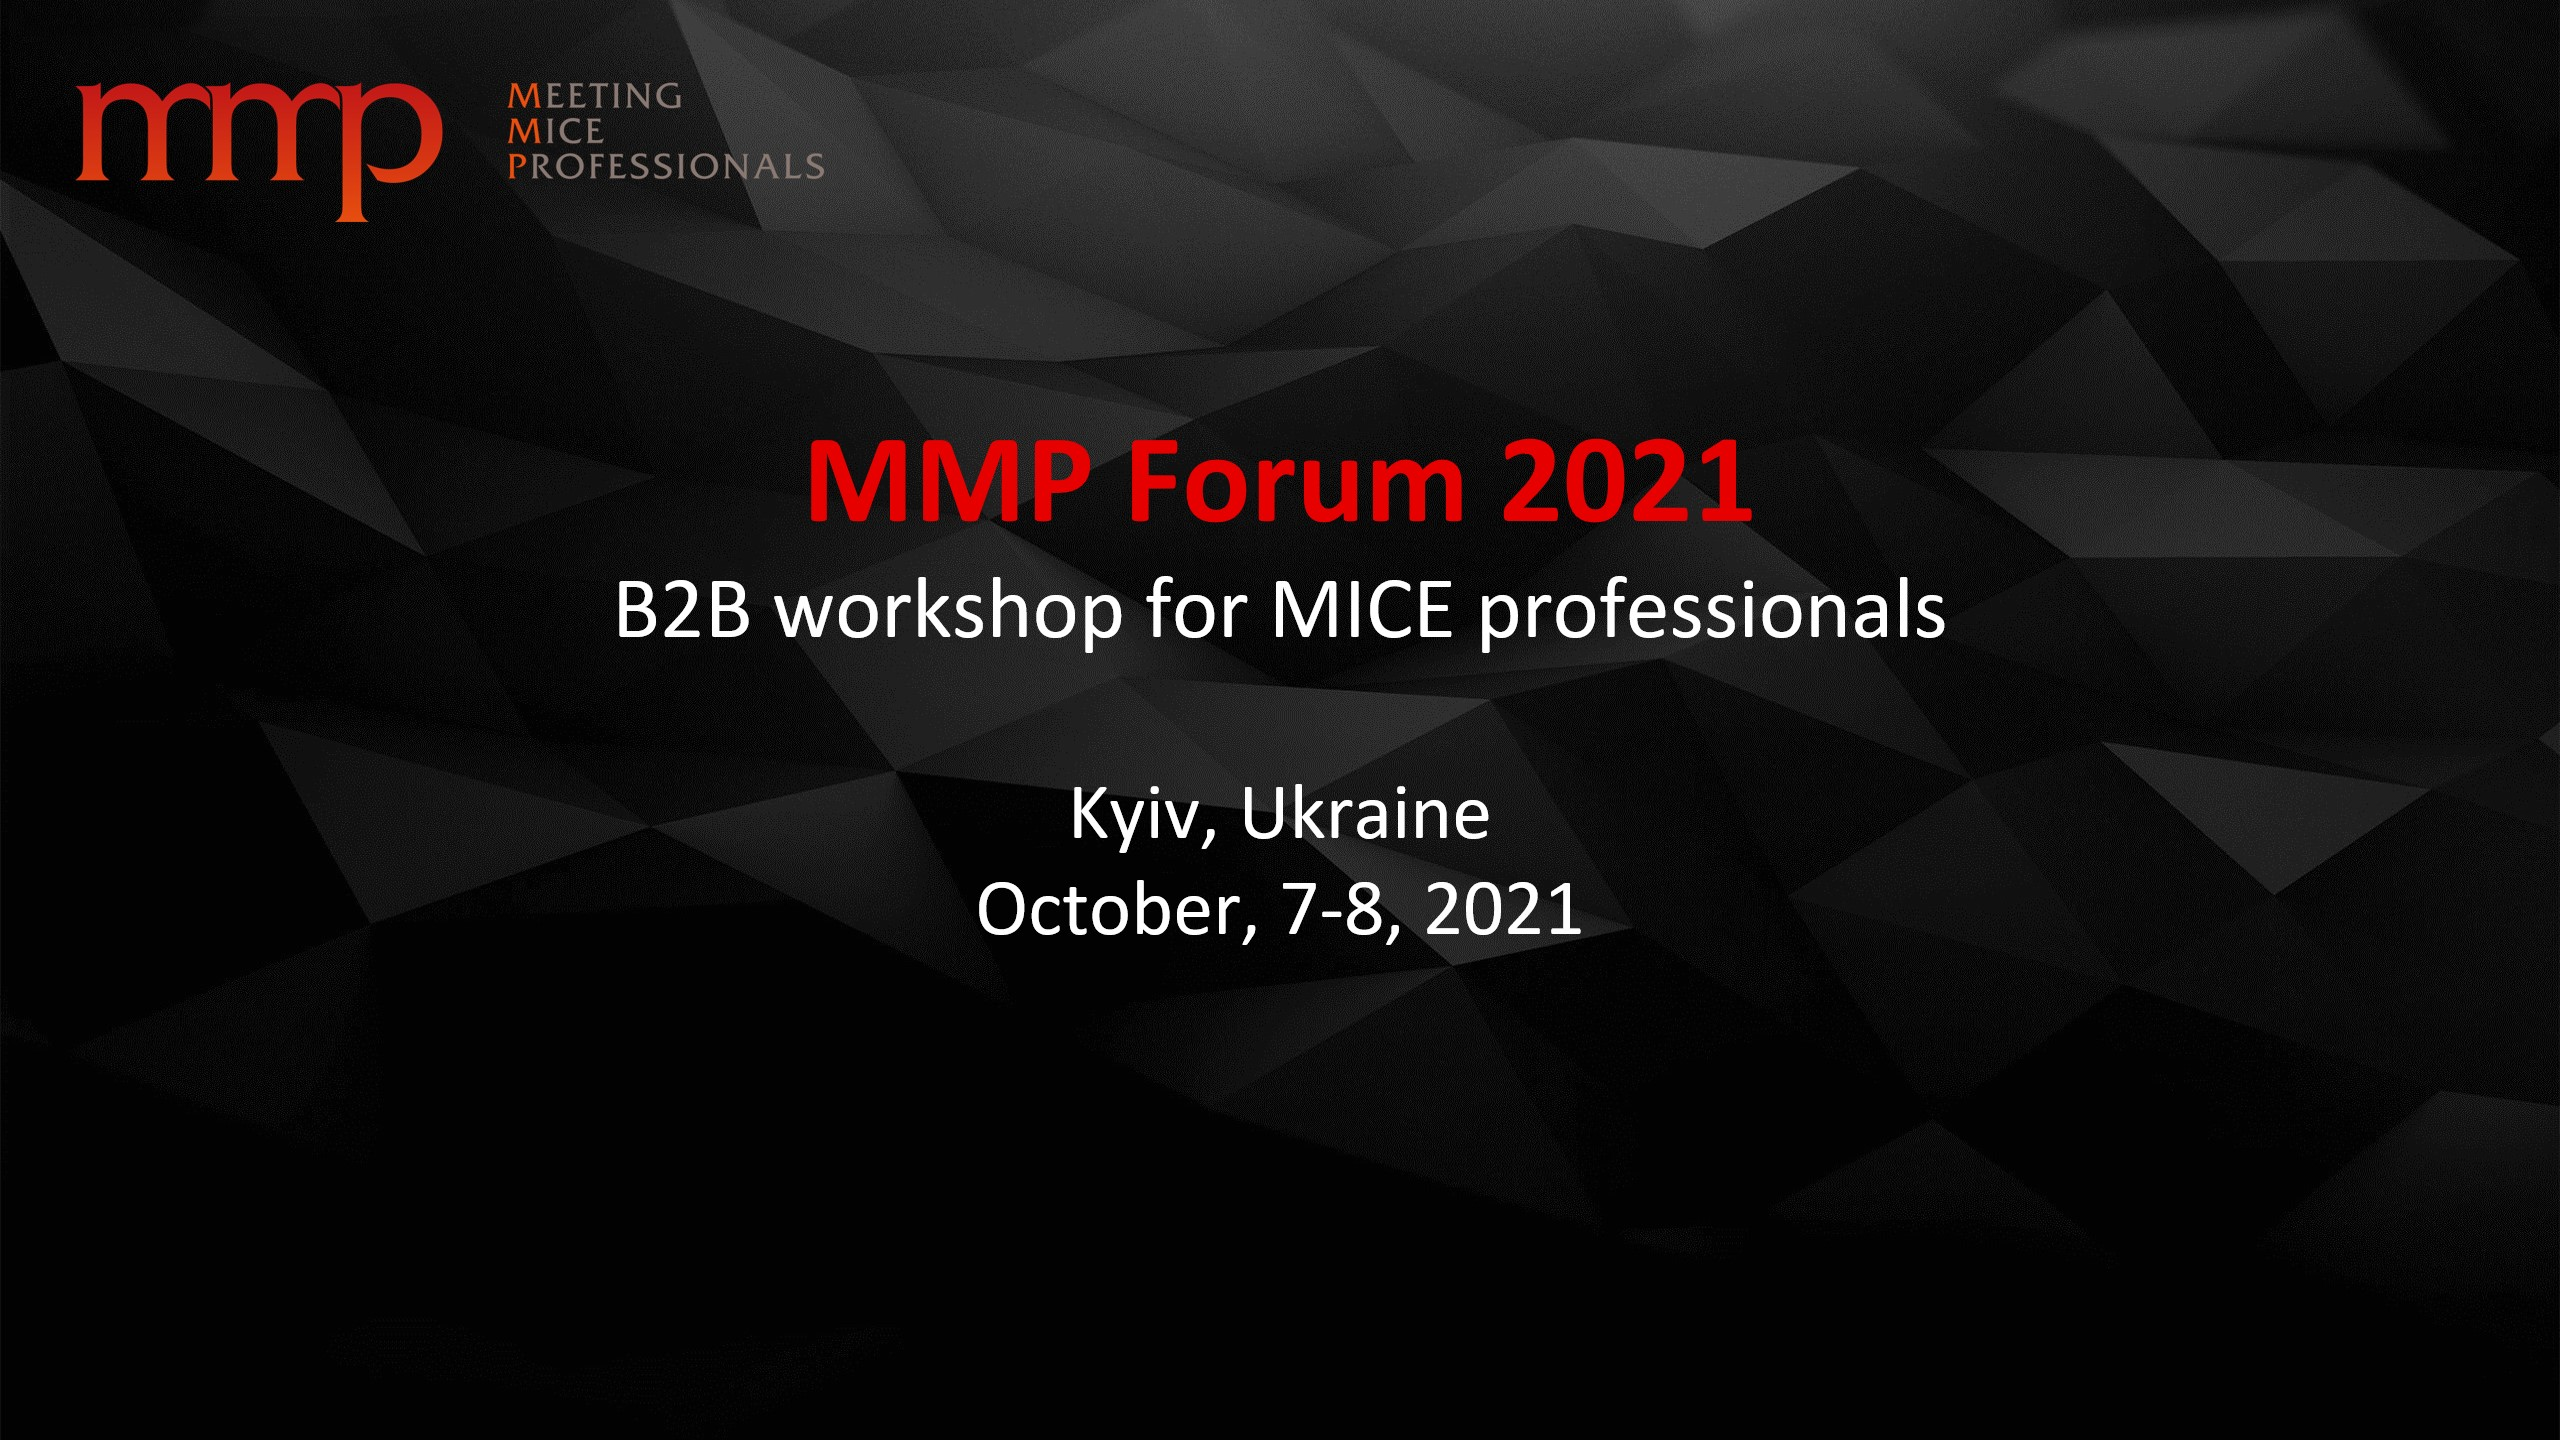 MMP Forum 2021